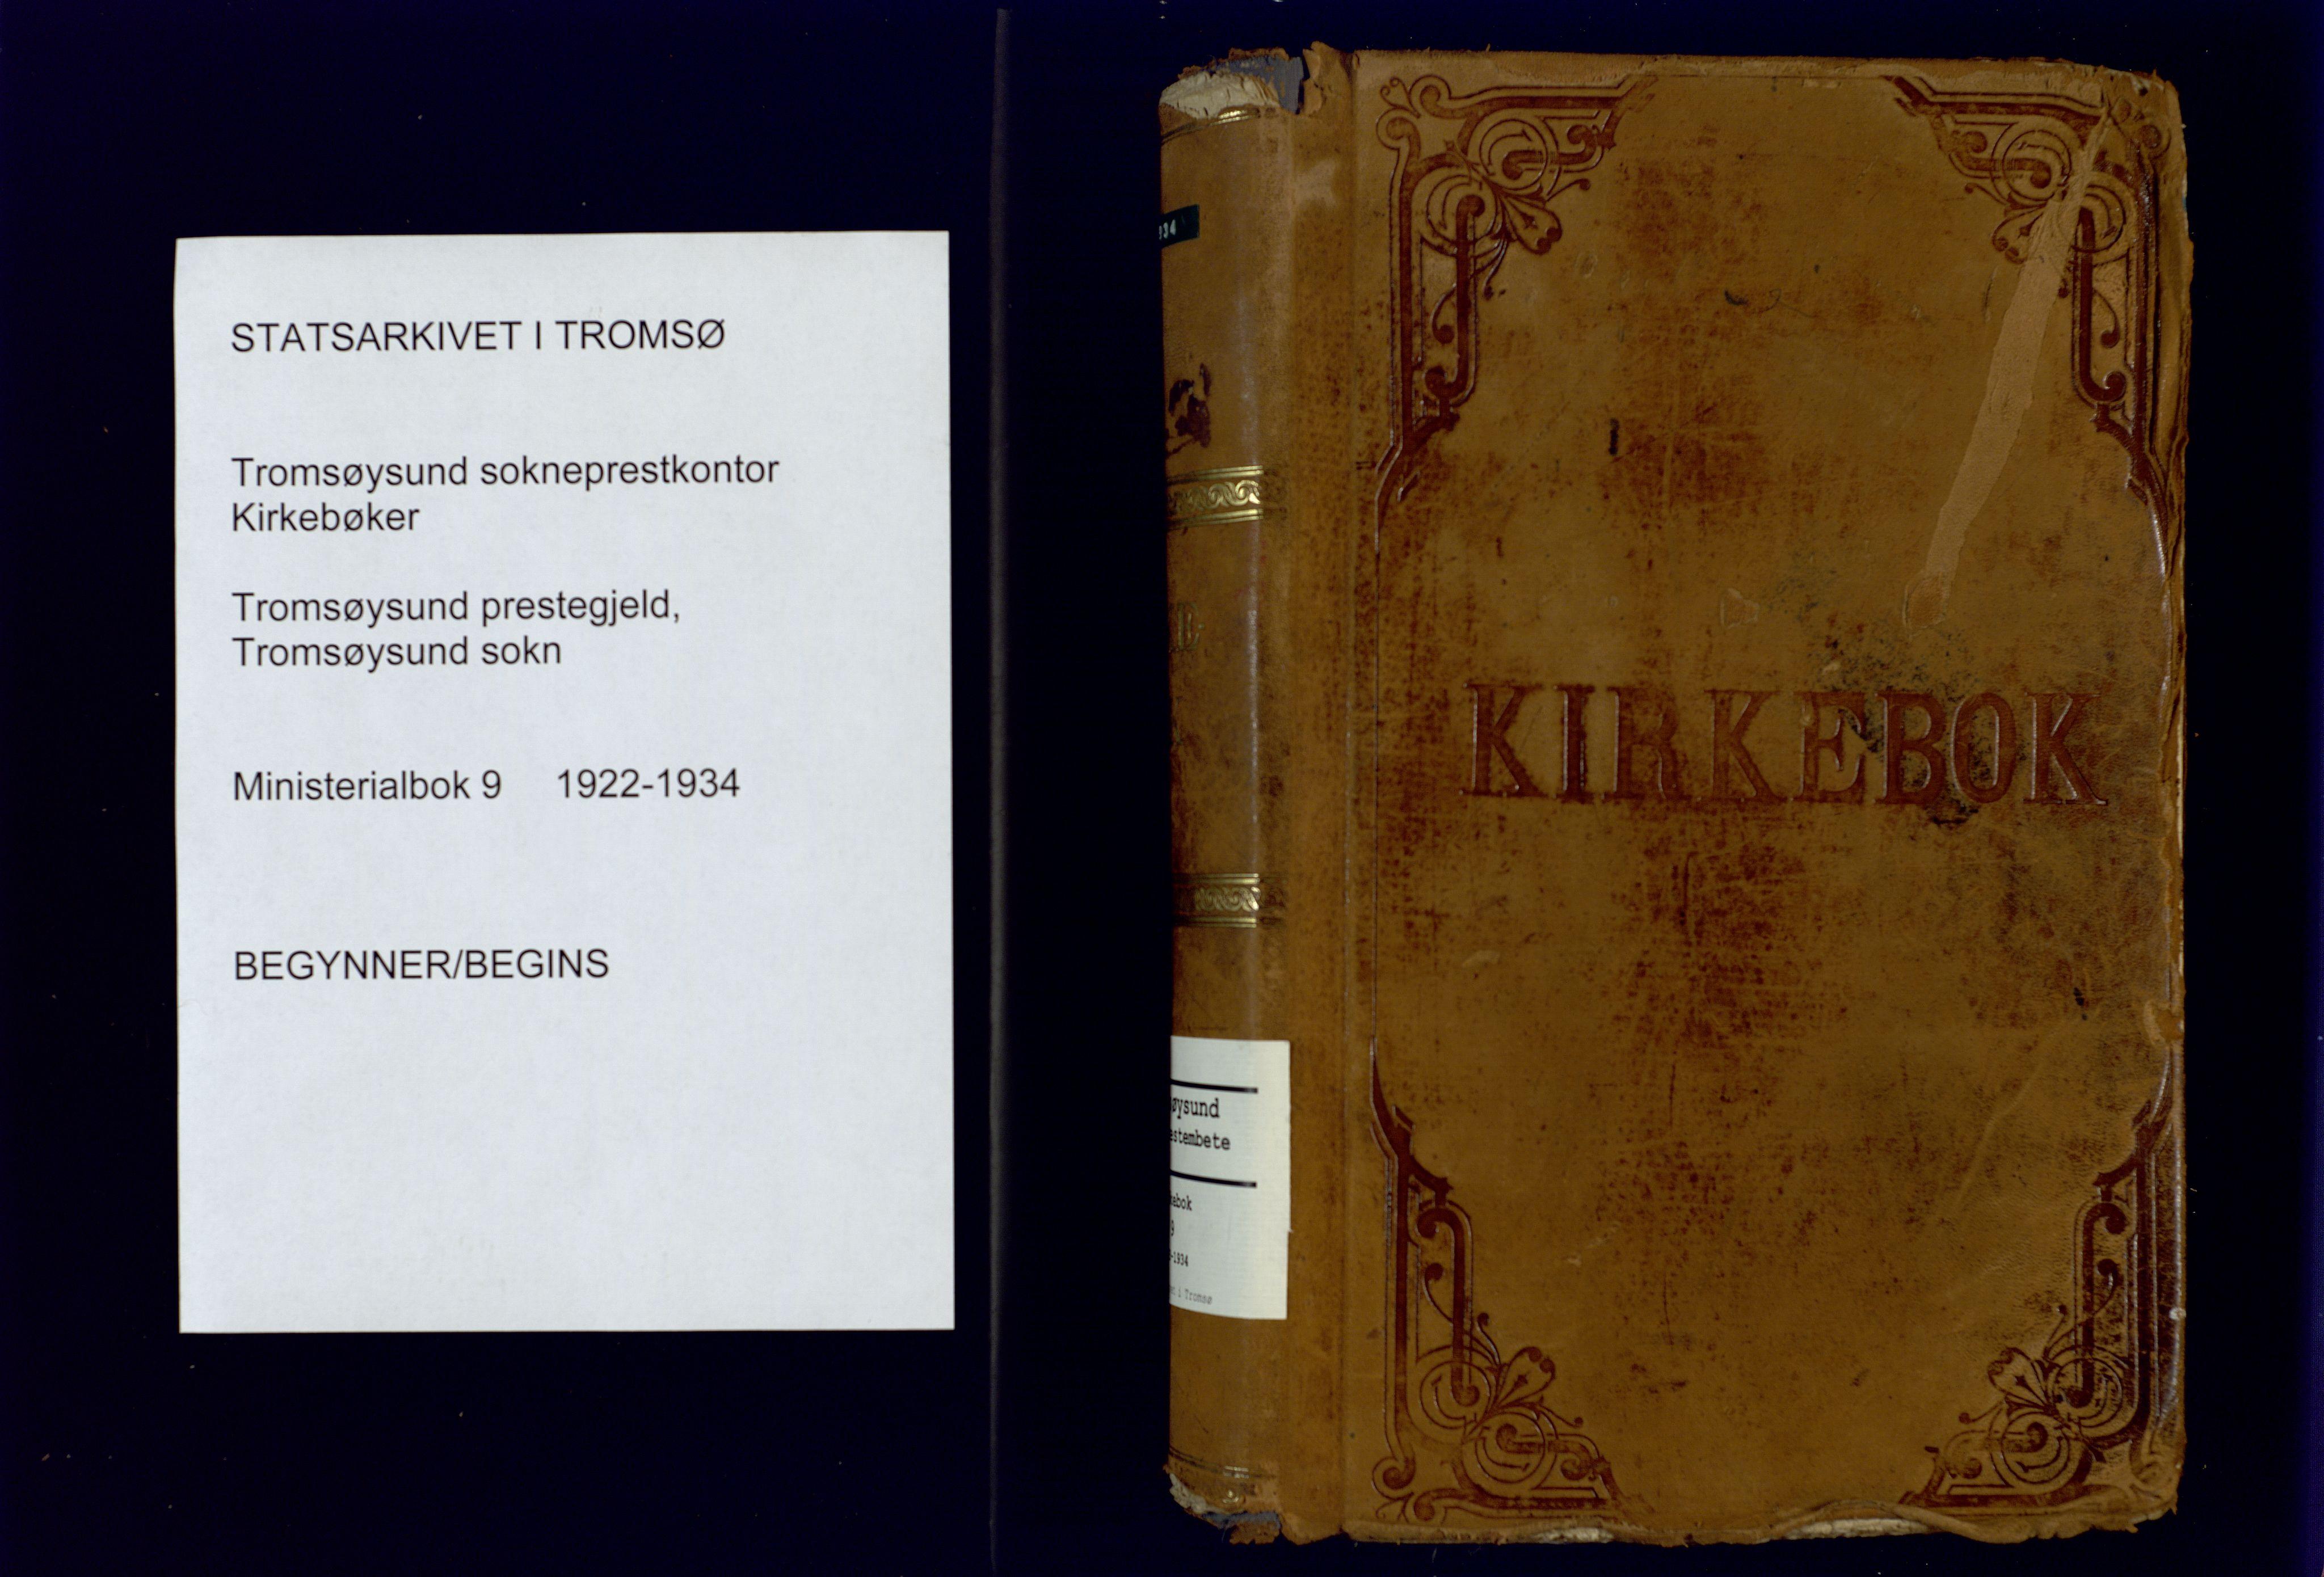 SATØ, Tromsøysund sokneprestkontor, G/Ga: Ministerialbok nr. 9, 1922-1934